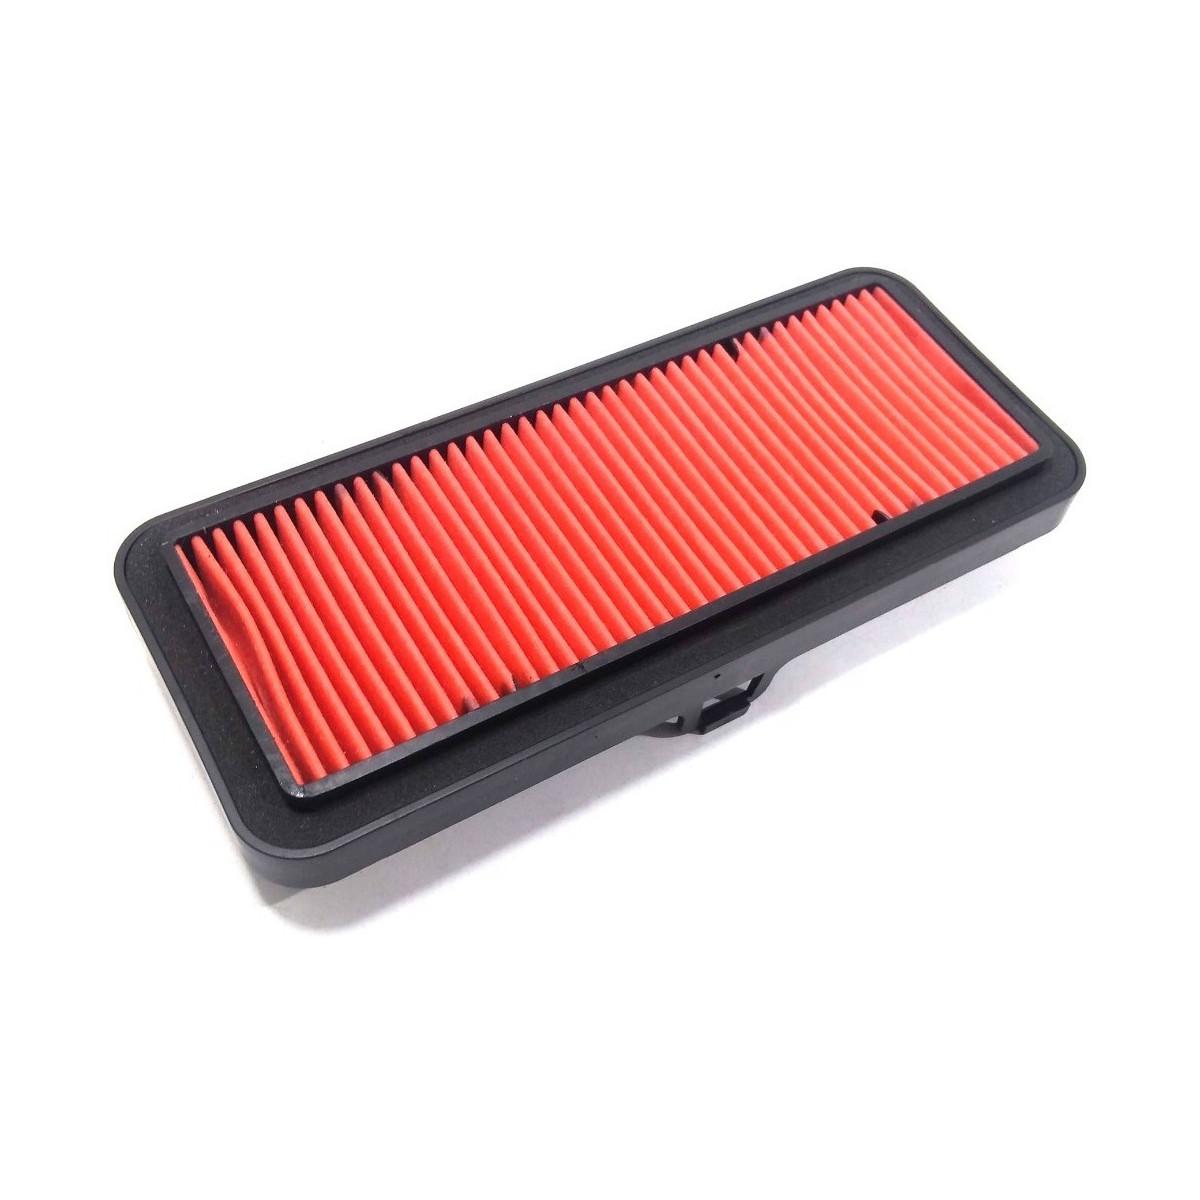 Filtro Aire Kymco Venox 250 Original